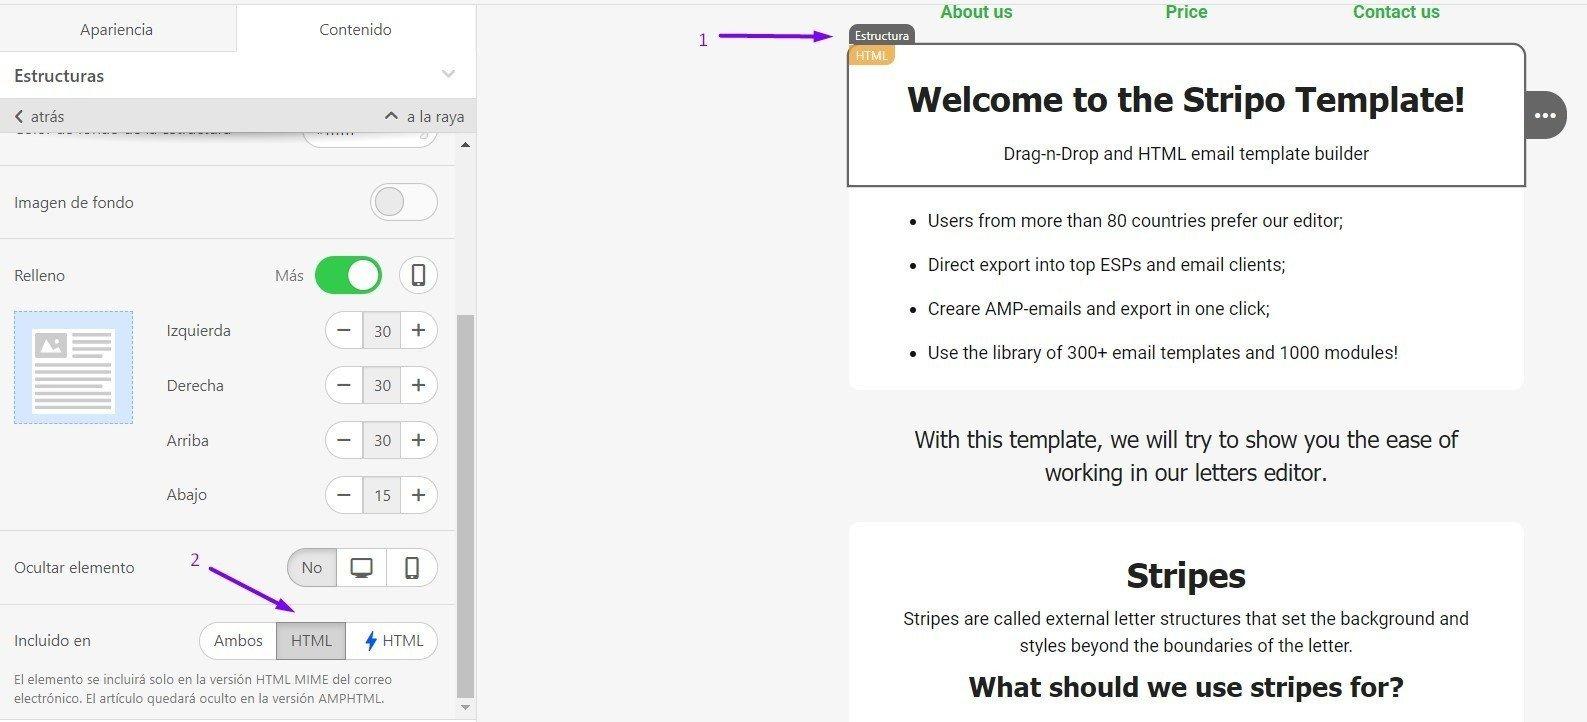 Estructura HTML es